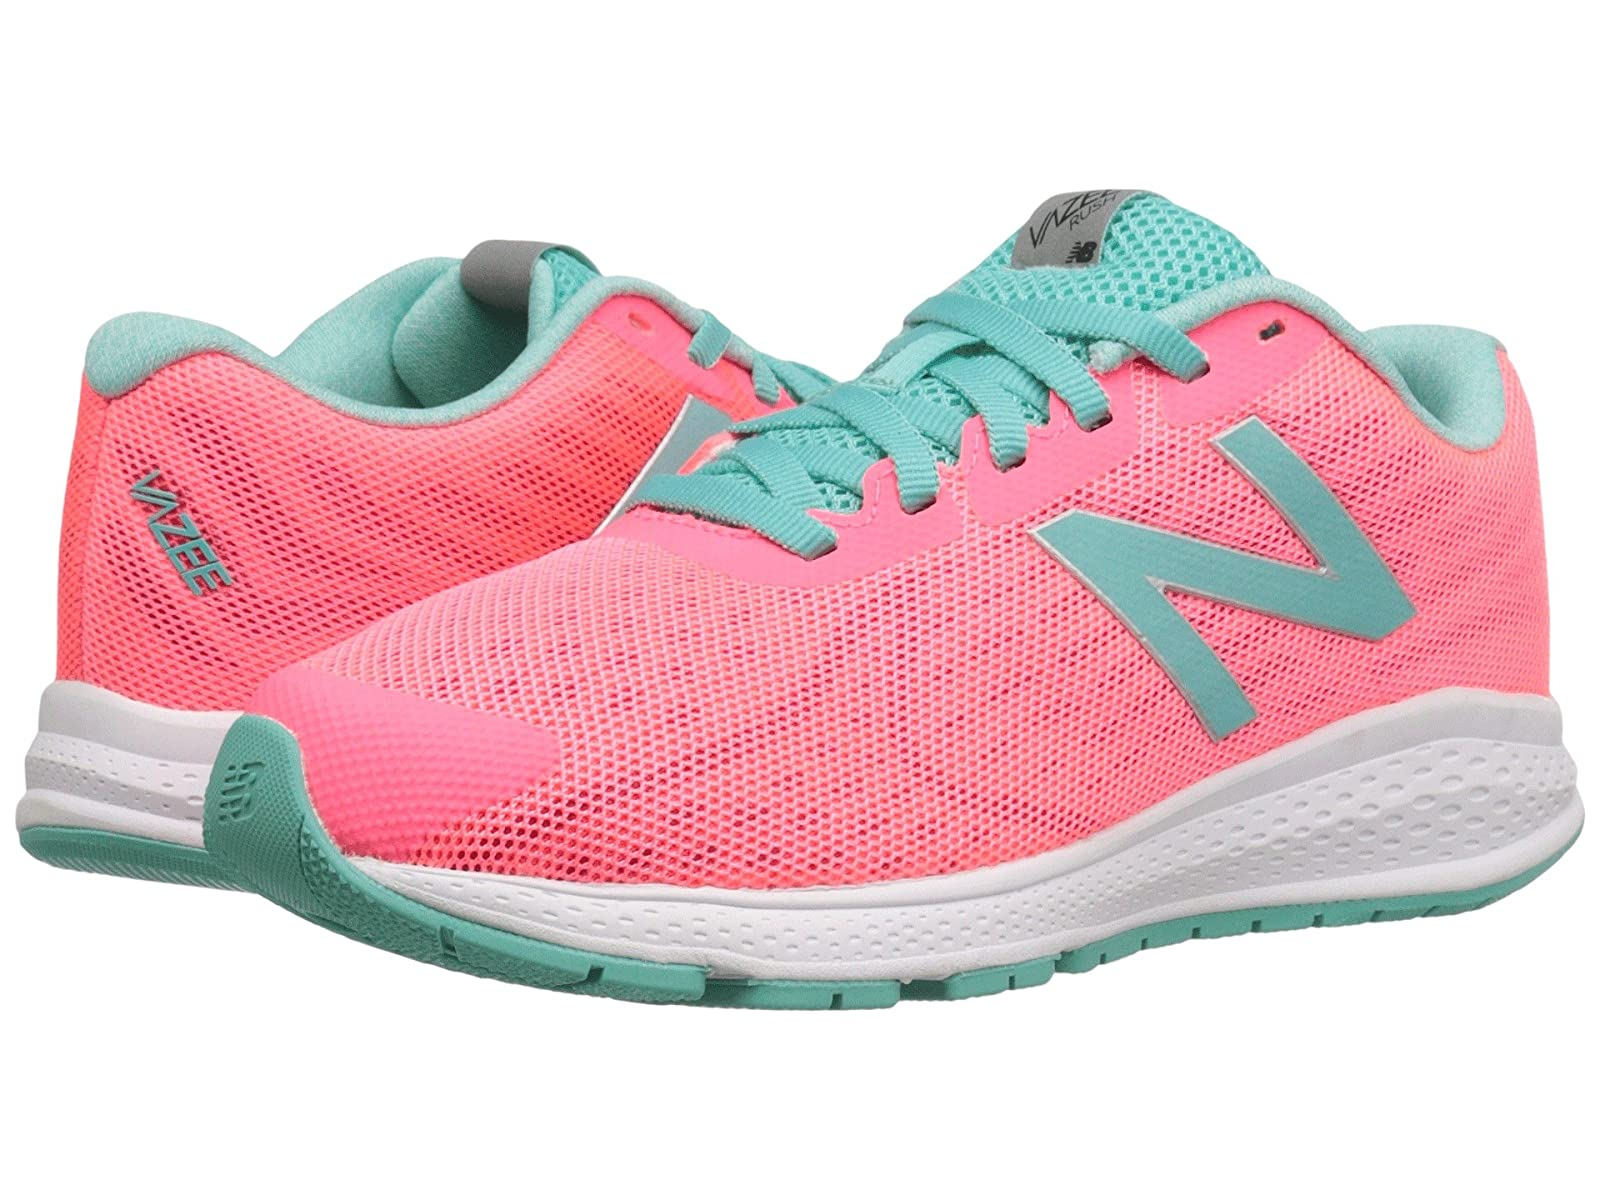 New Balance Kids Vazee Rush v2 (Big Kid)Cheap and distinctive eye-catching shoes